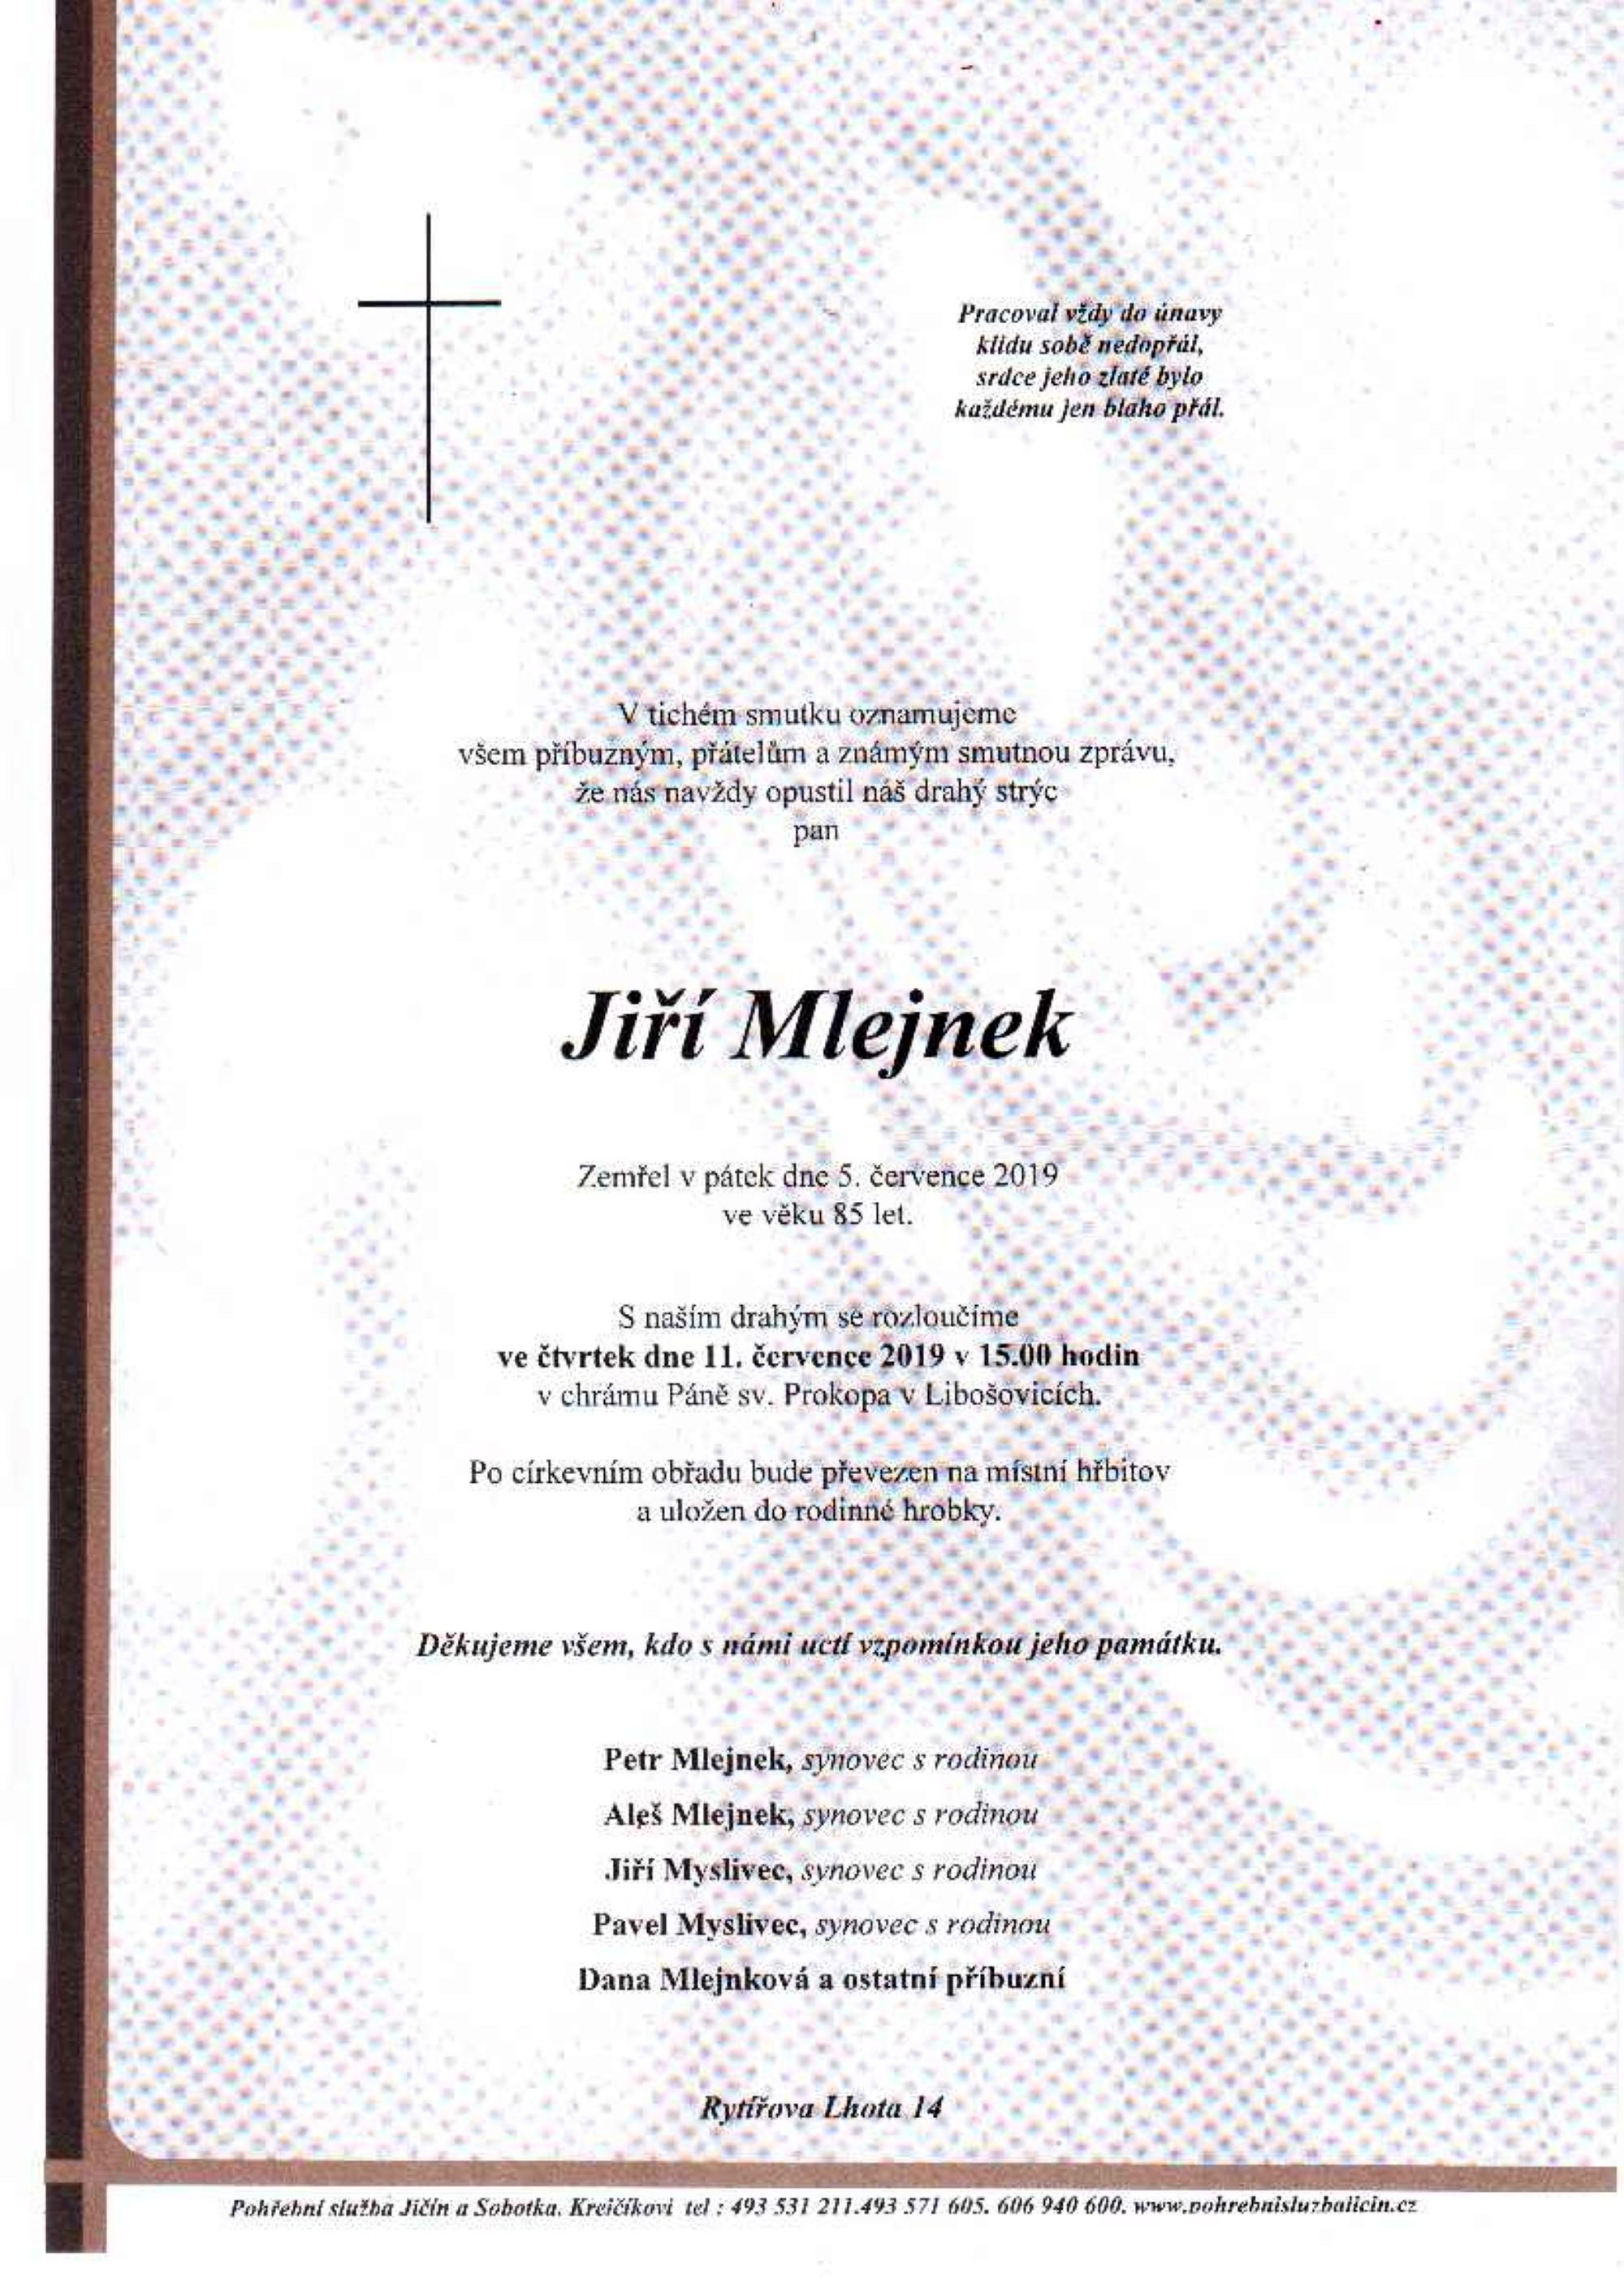 Jiří Mlejnek